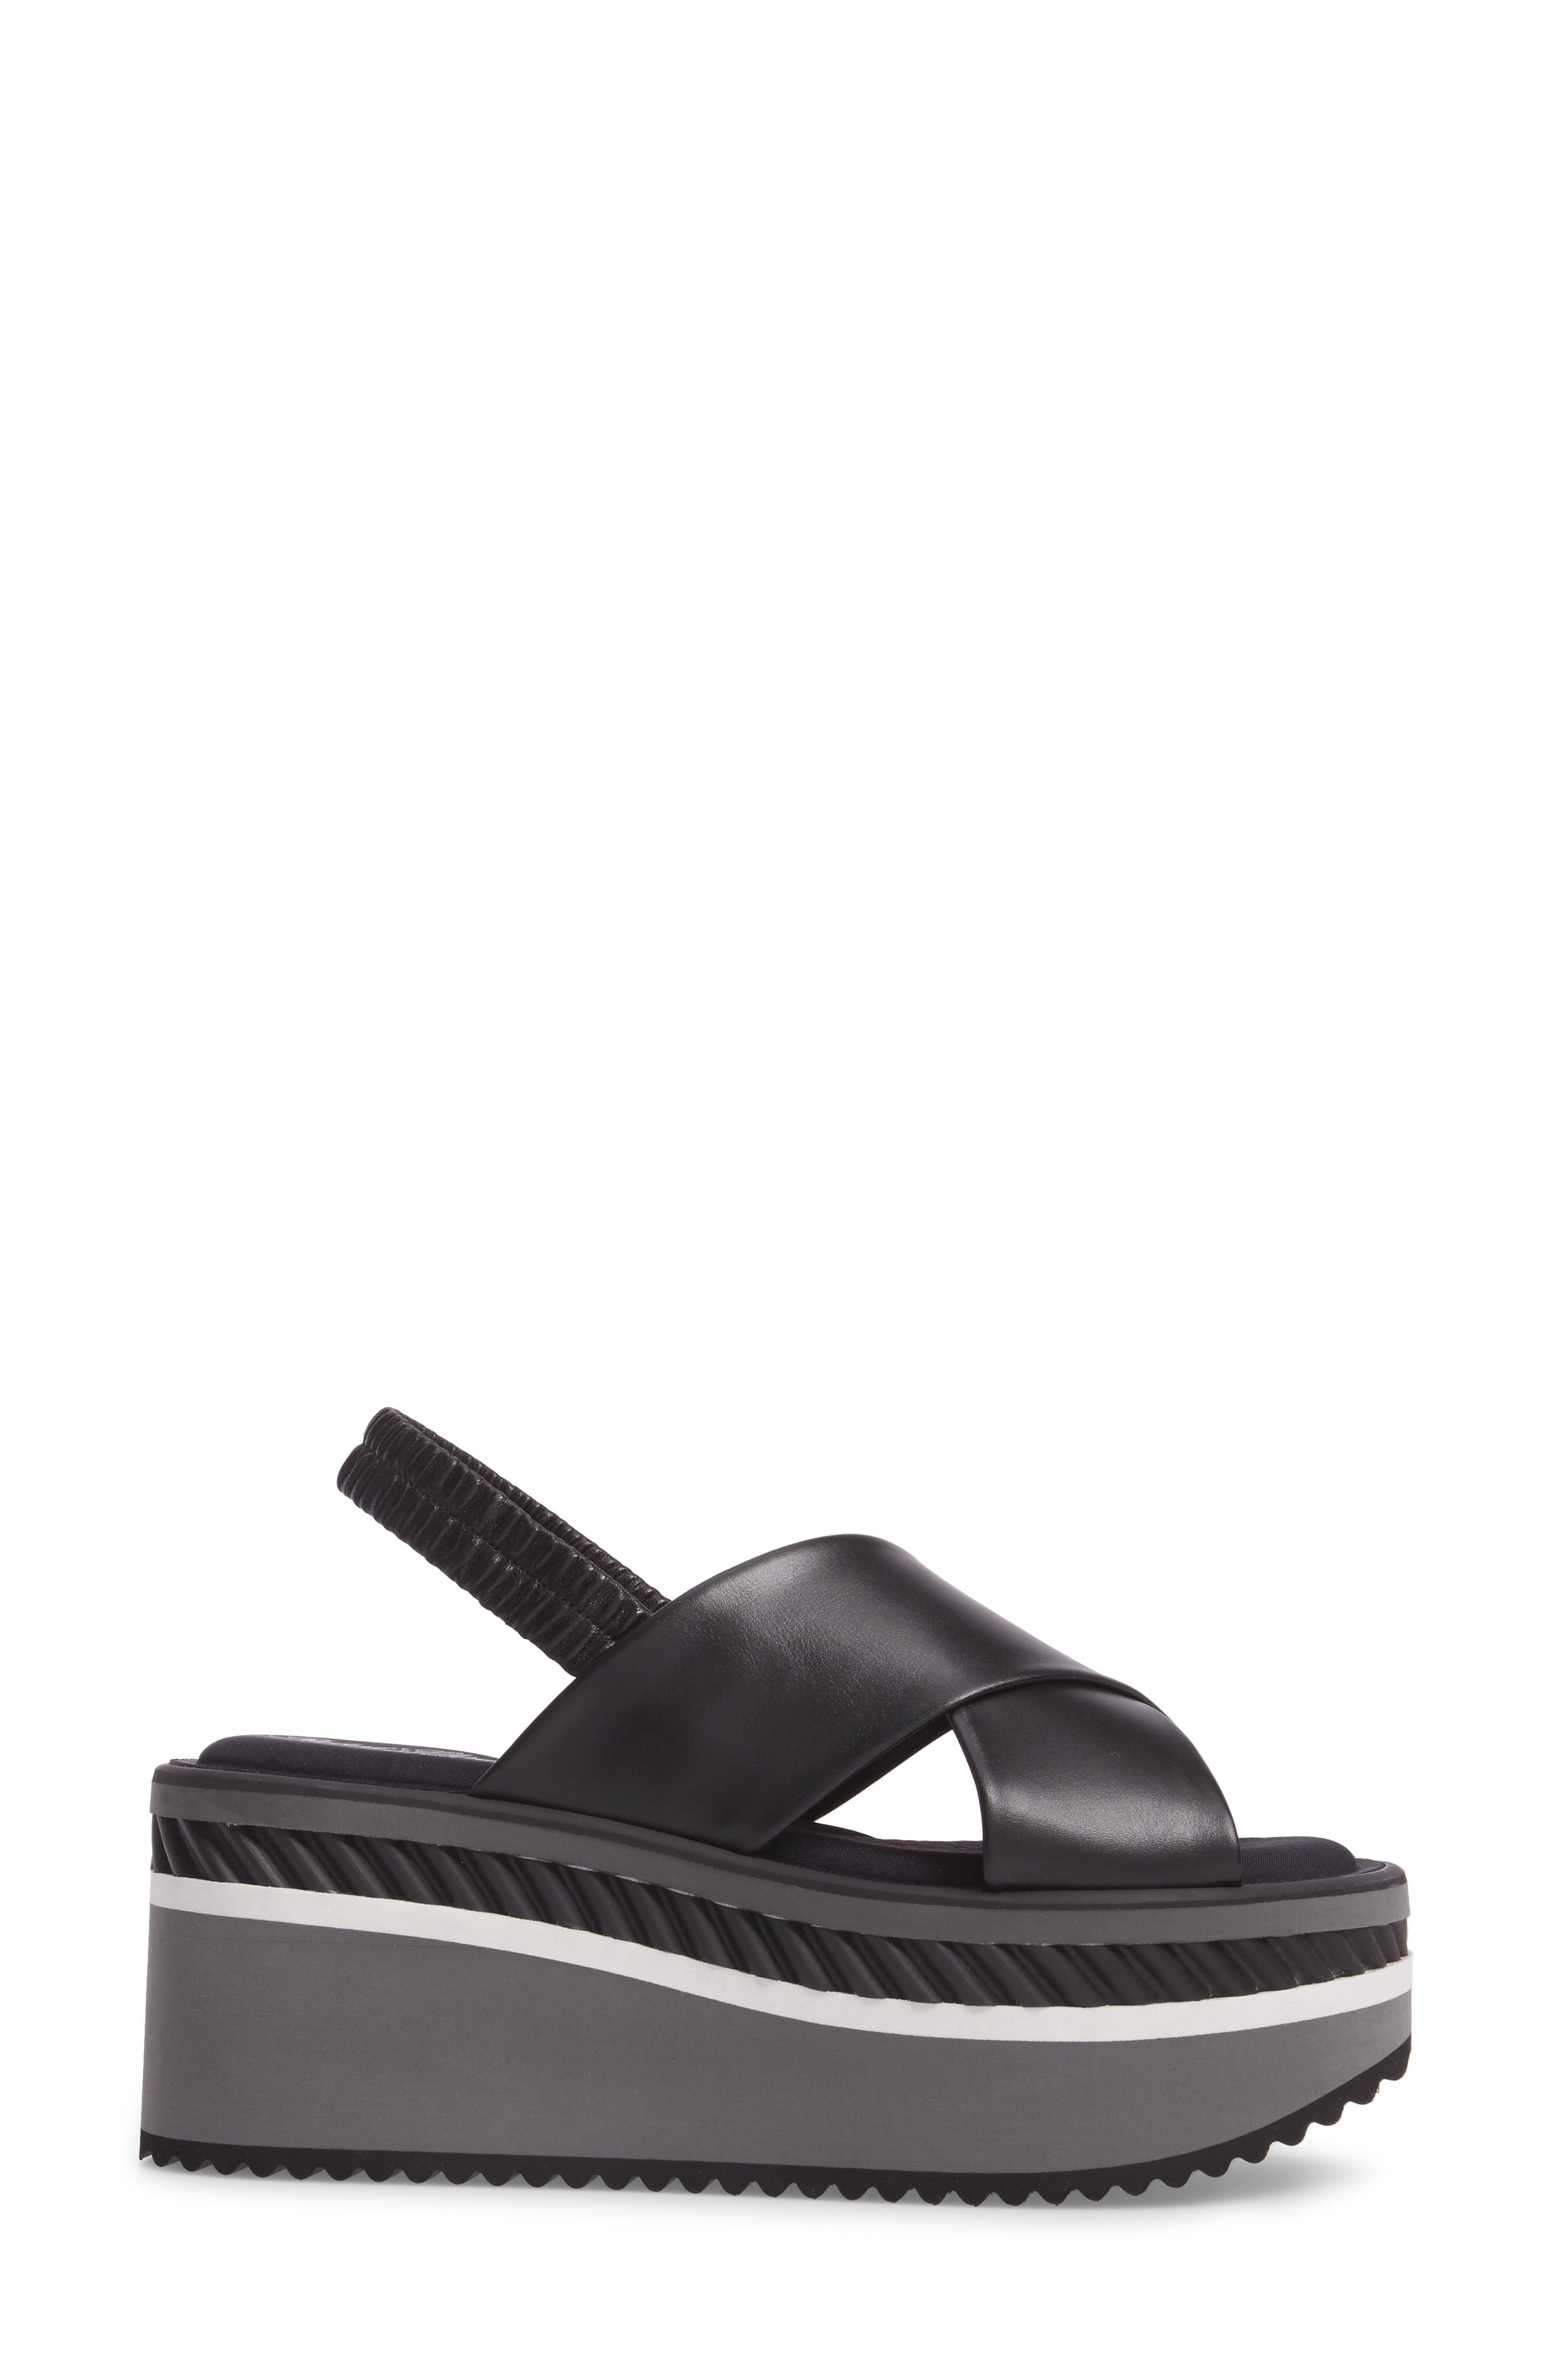 Omin Platform Slingback Sandal,                             Alternate thumbnail 3, color,                             Black